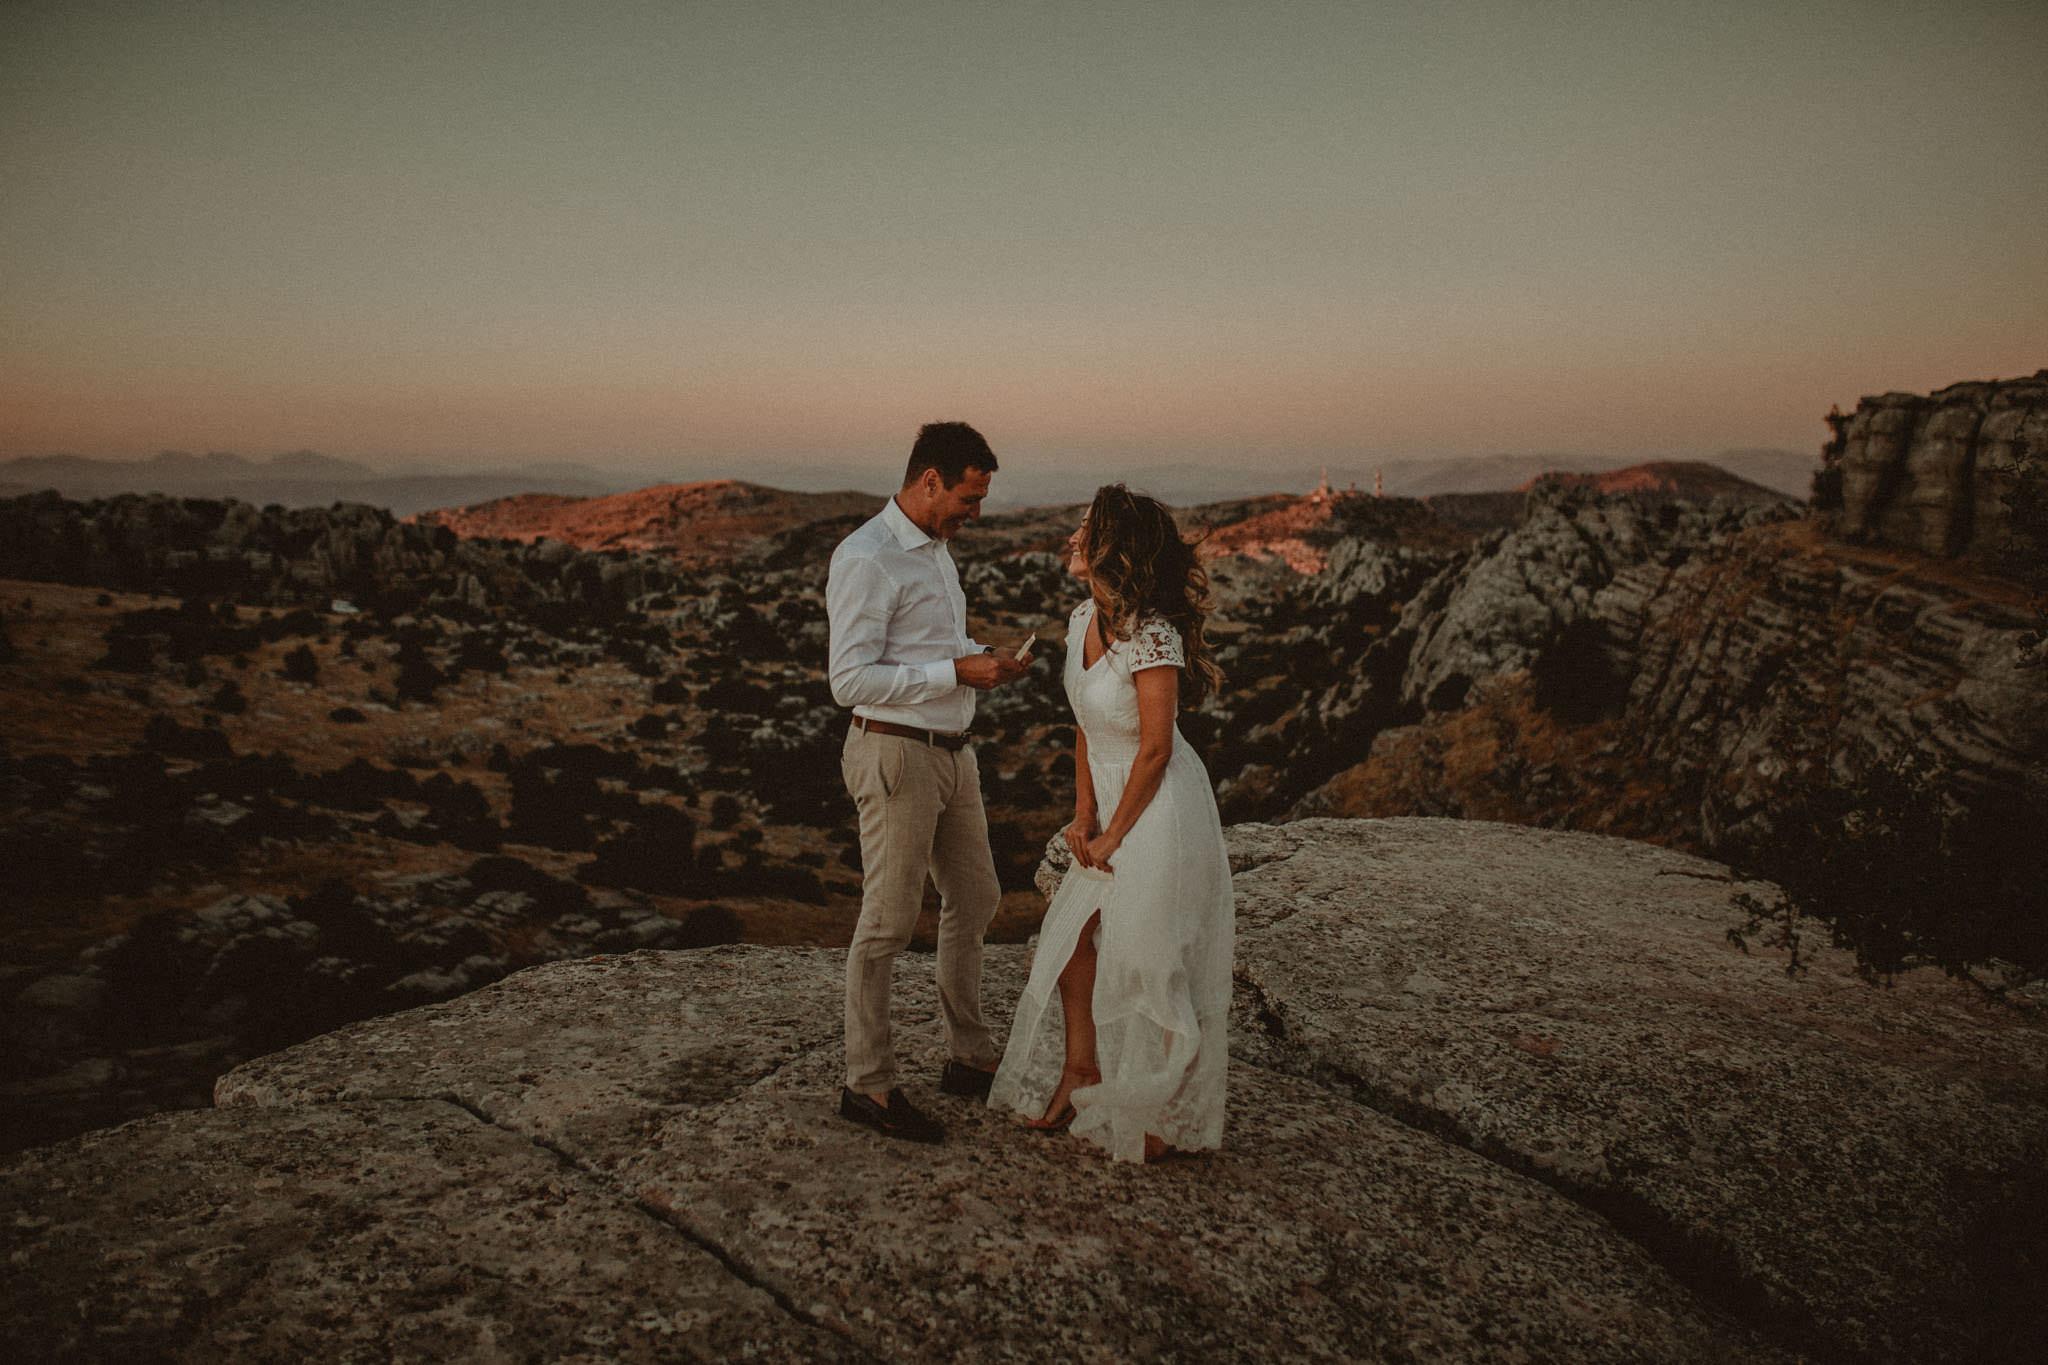 mejor fotógrafo de bodas en Malaga, Marbella